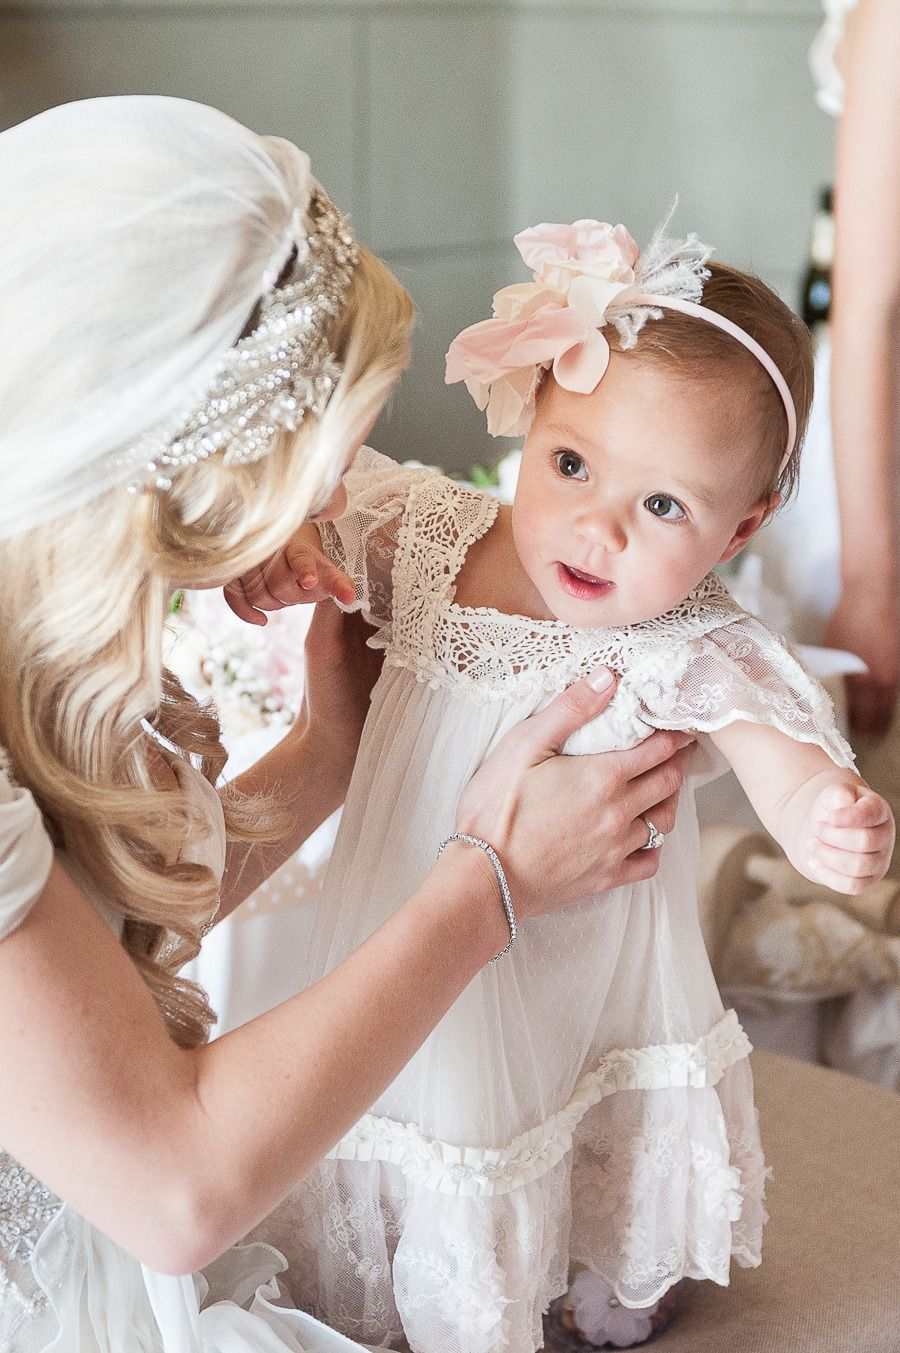 a-wedding-scrapbook:  Milk Photography